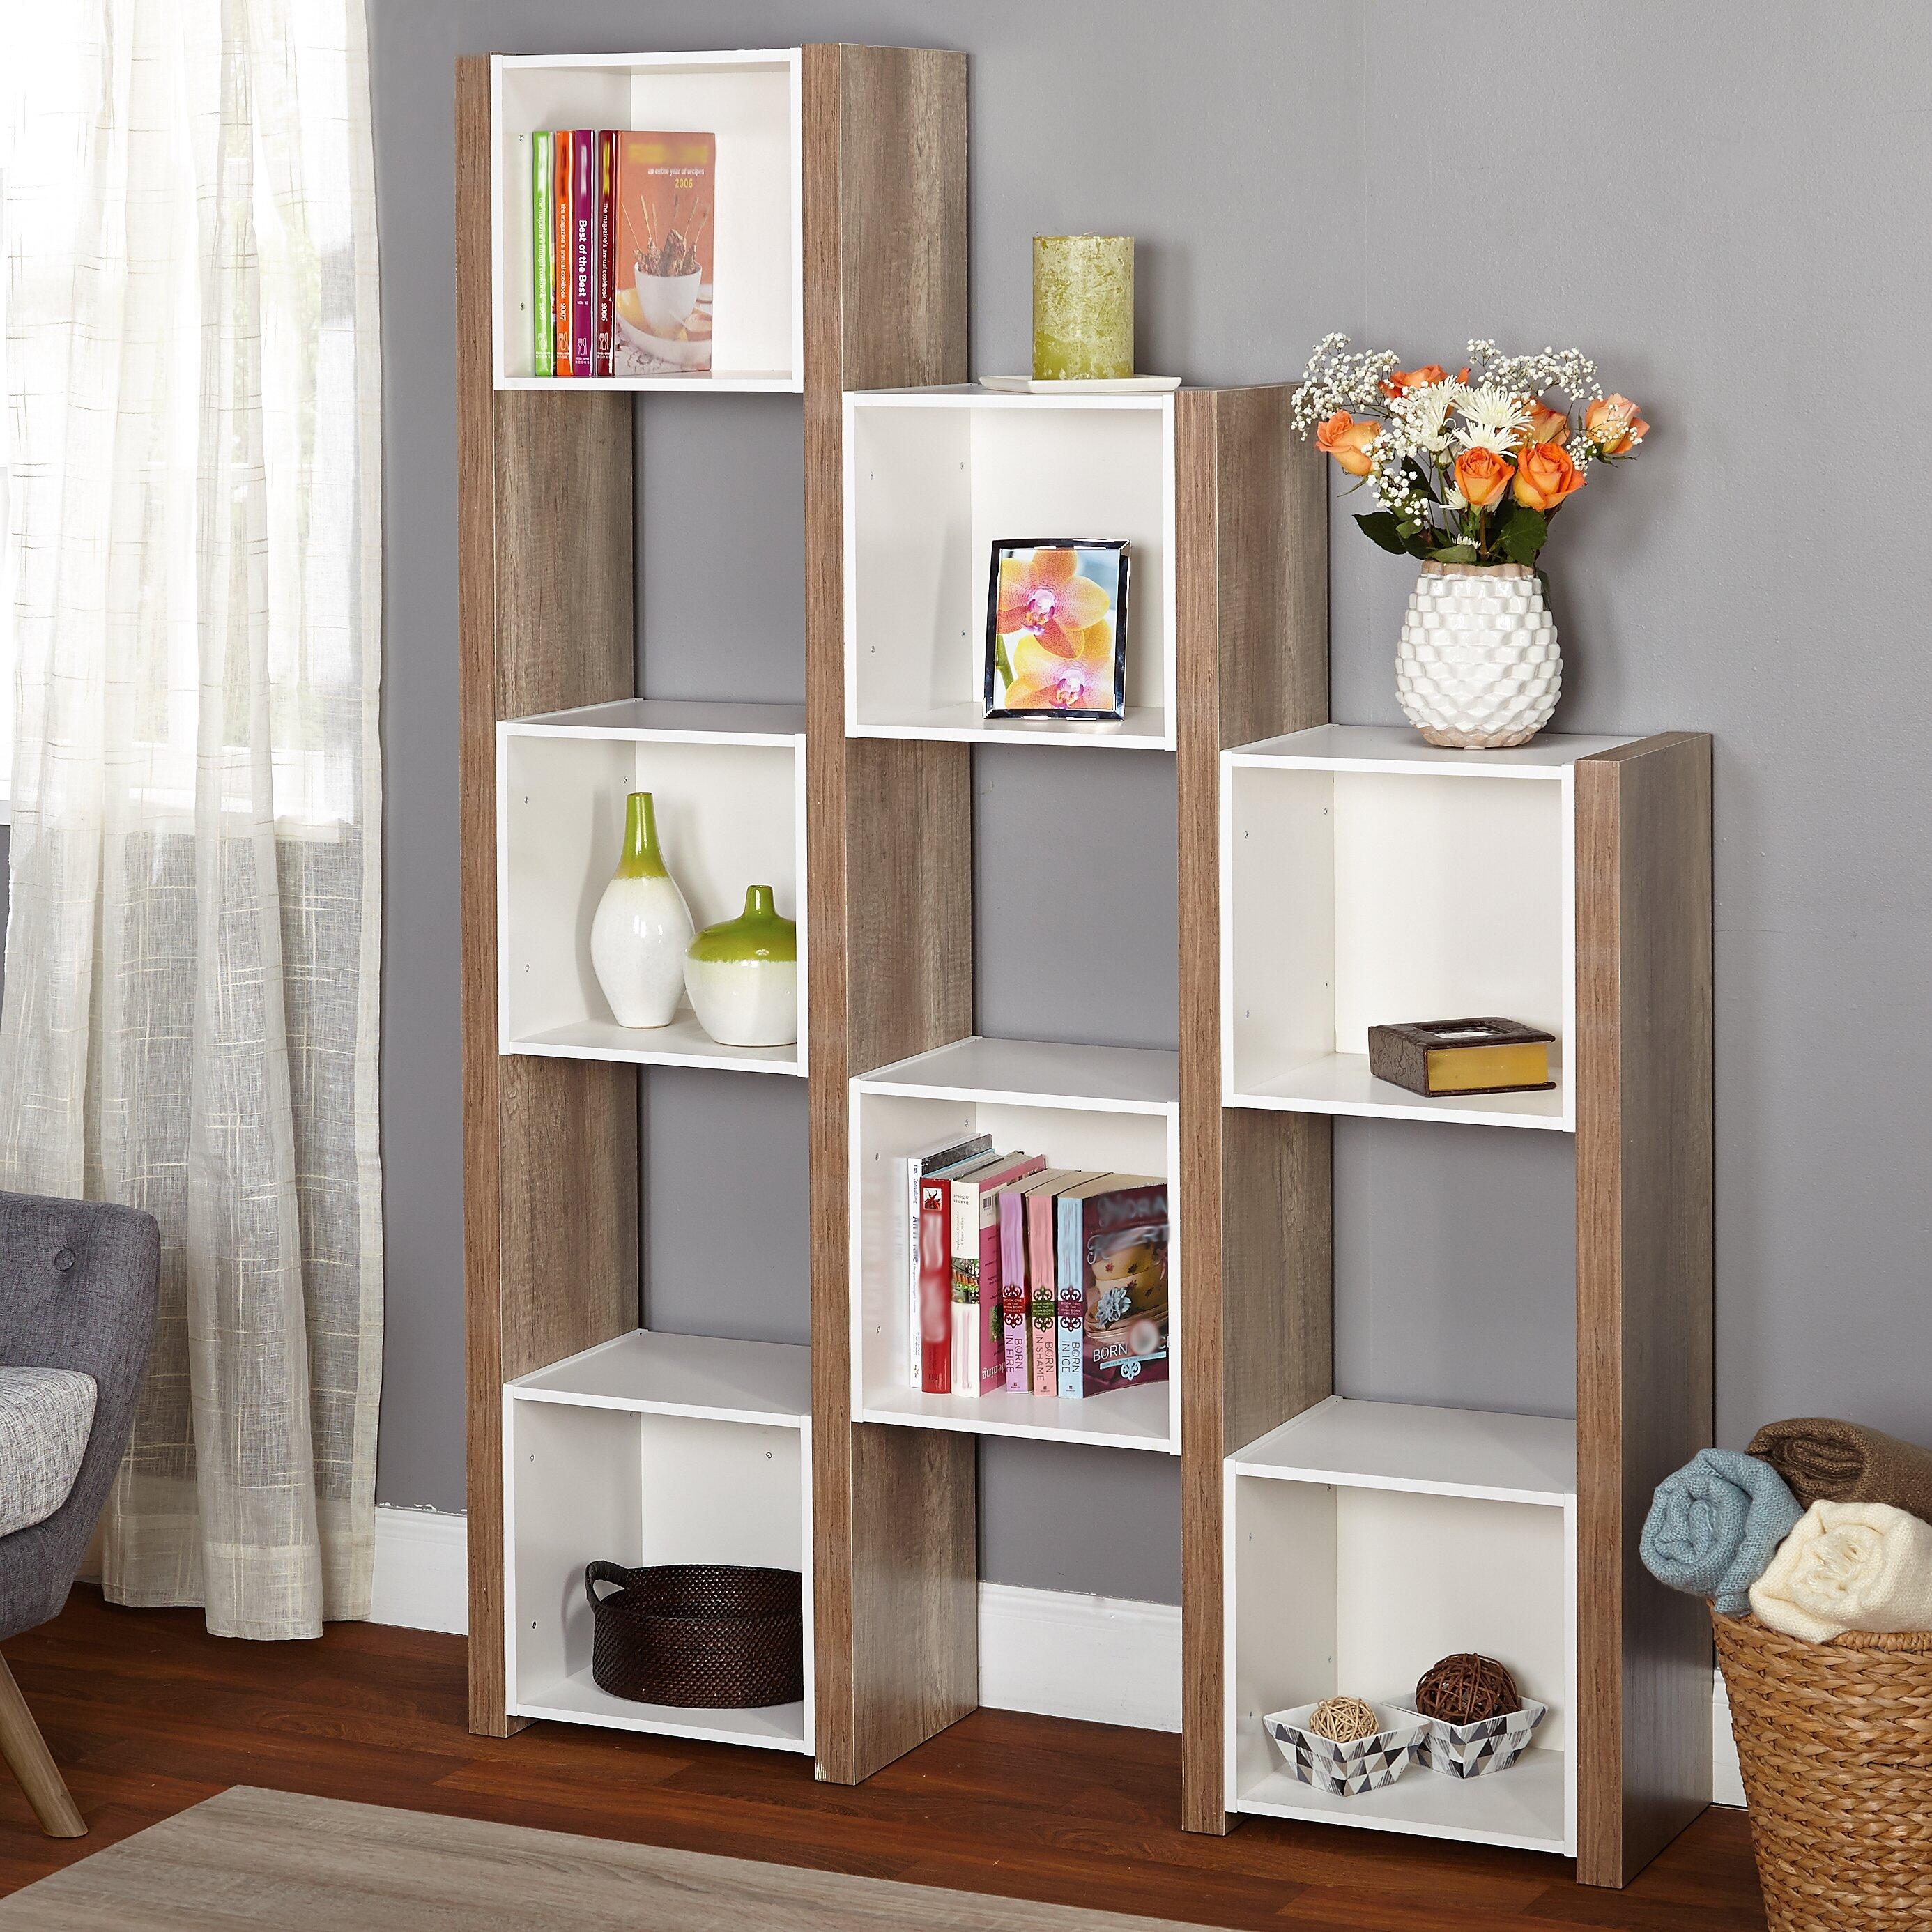 tms urban 71 cube unit bookcase reviews wayfair. Black Bedroom Furniture Sets. Home Design Ideas